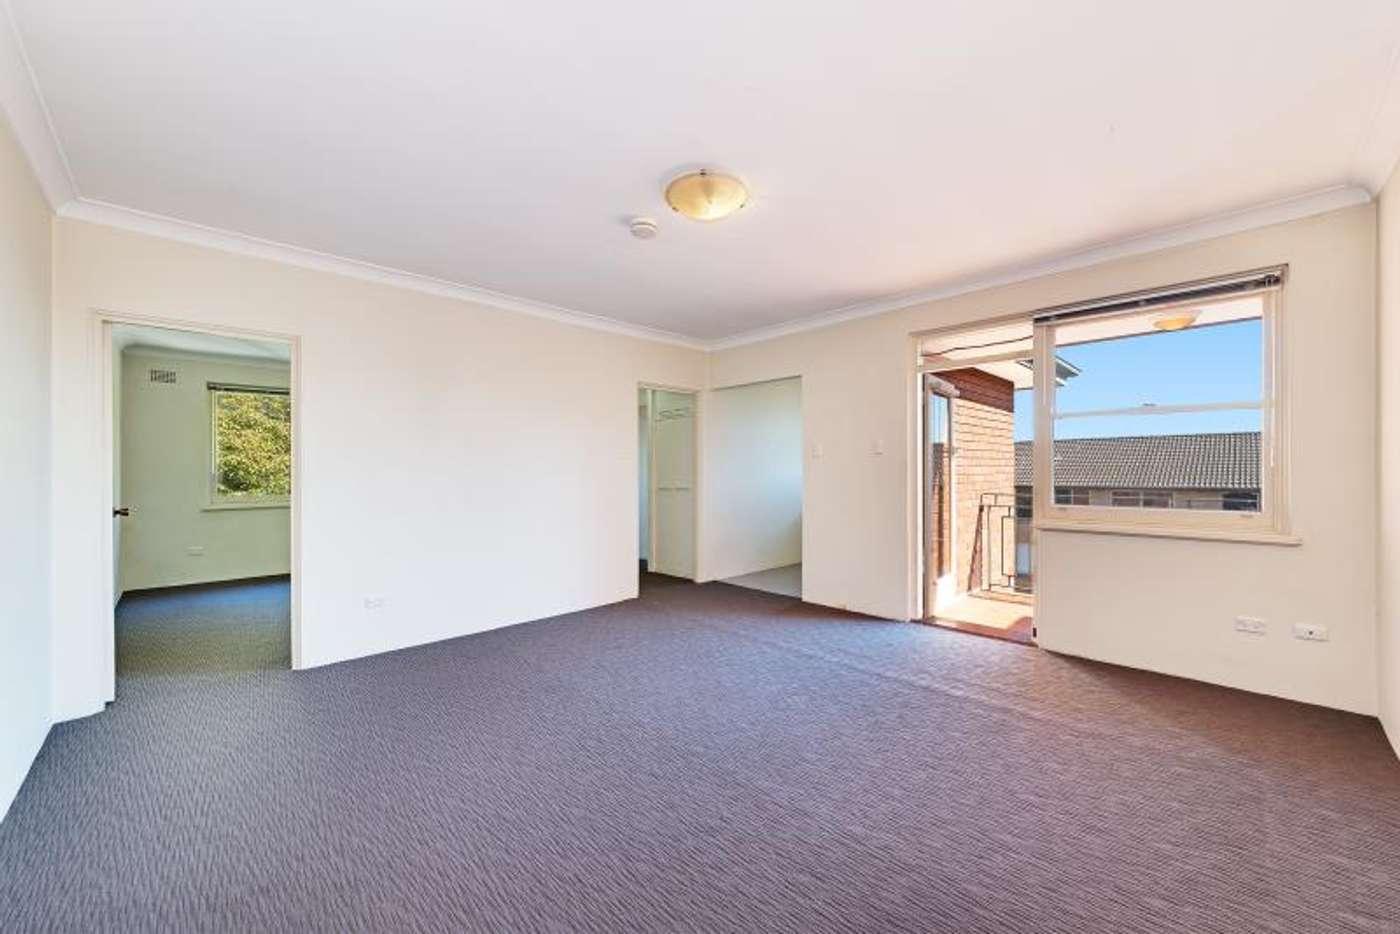 Main view of Homely apartment listing, 16/44 Waratah Avenue, Randwick NSW 2031